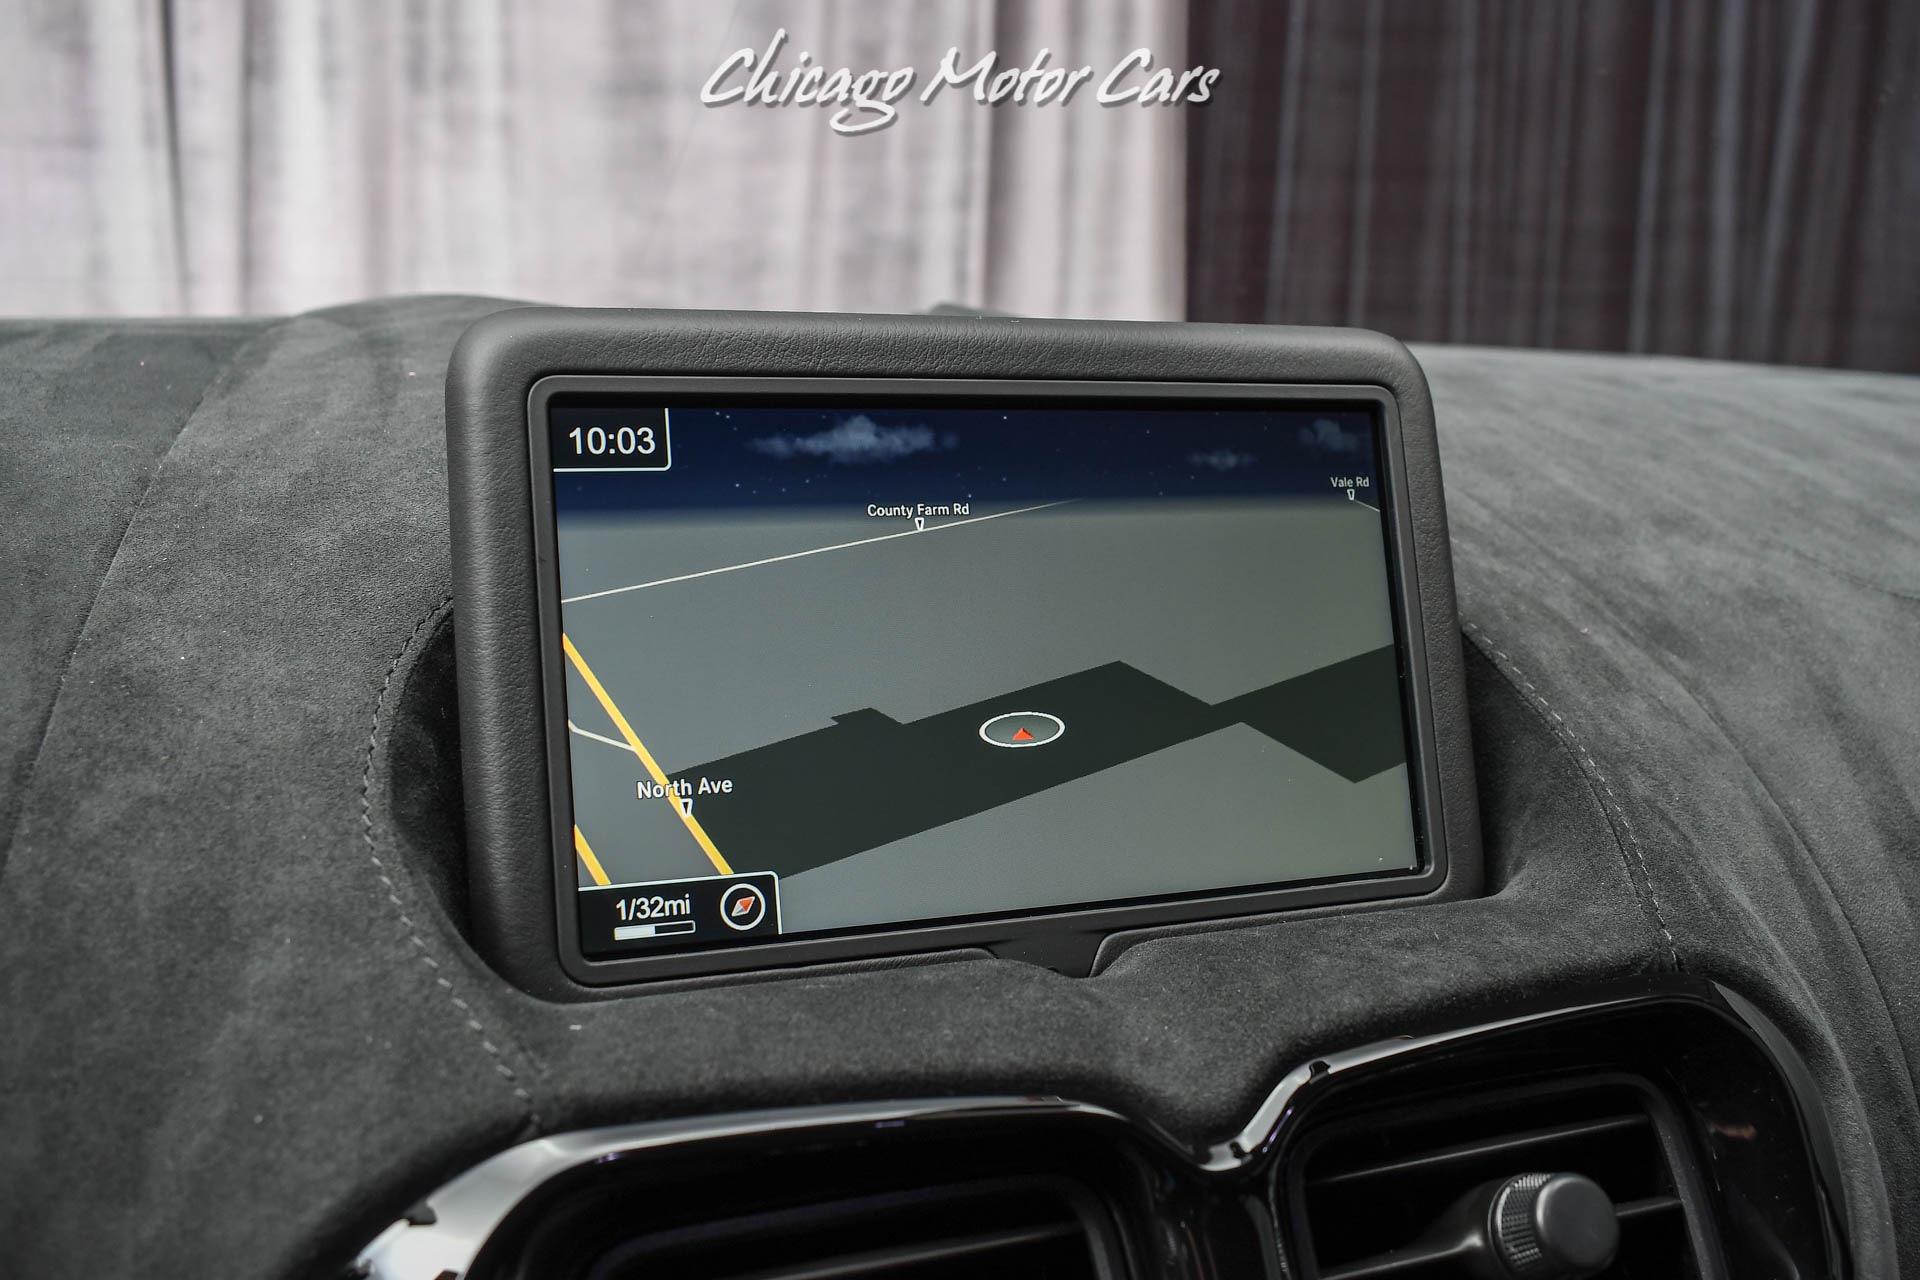 Used-2019-Aston-Martin-Vantage-Only-2400-Miles-Loaded-Alcantara-Interior-Pristine-Example